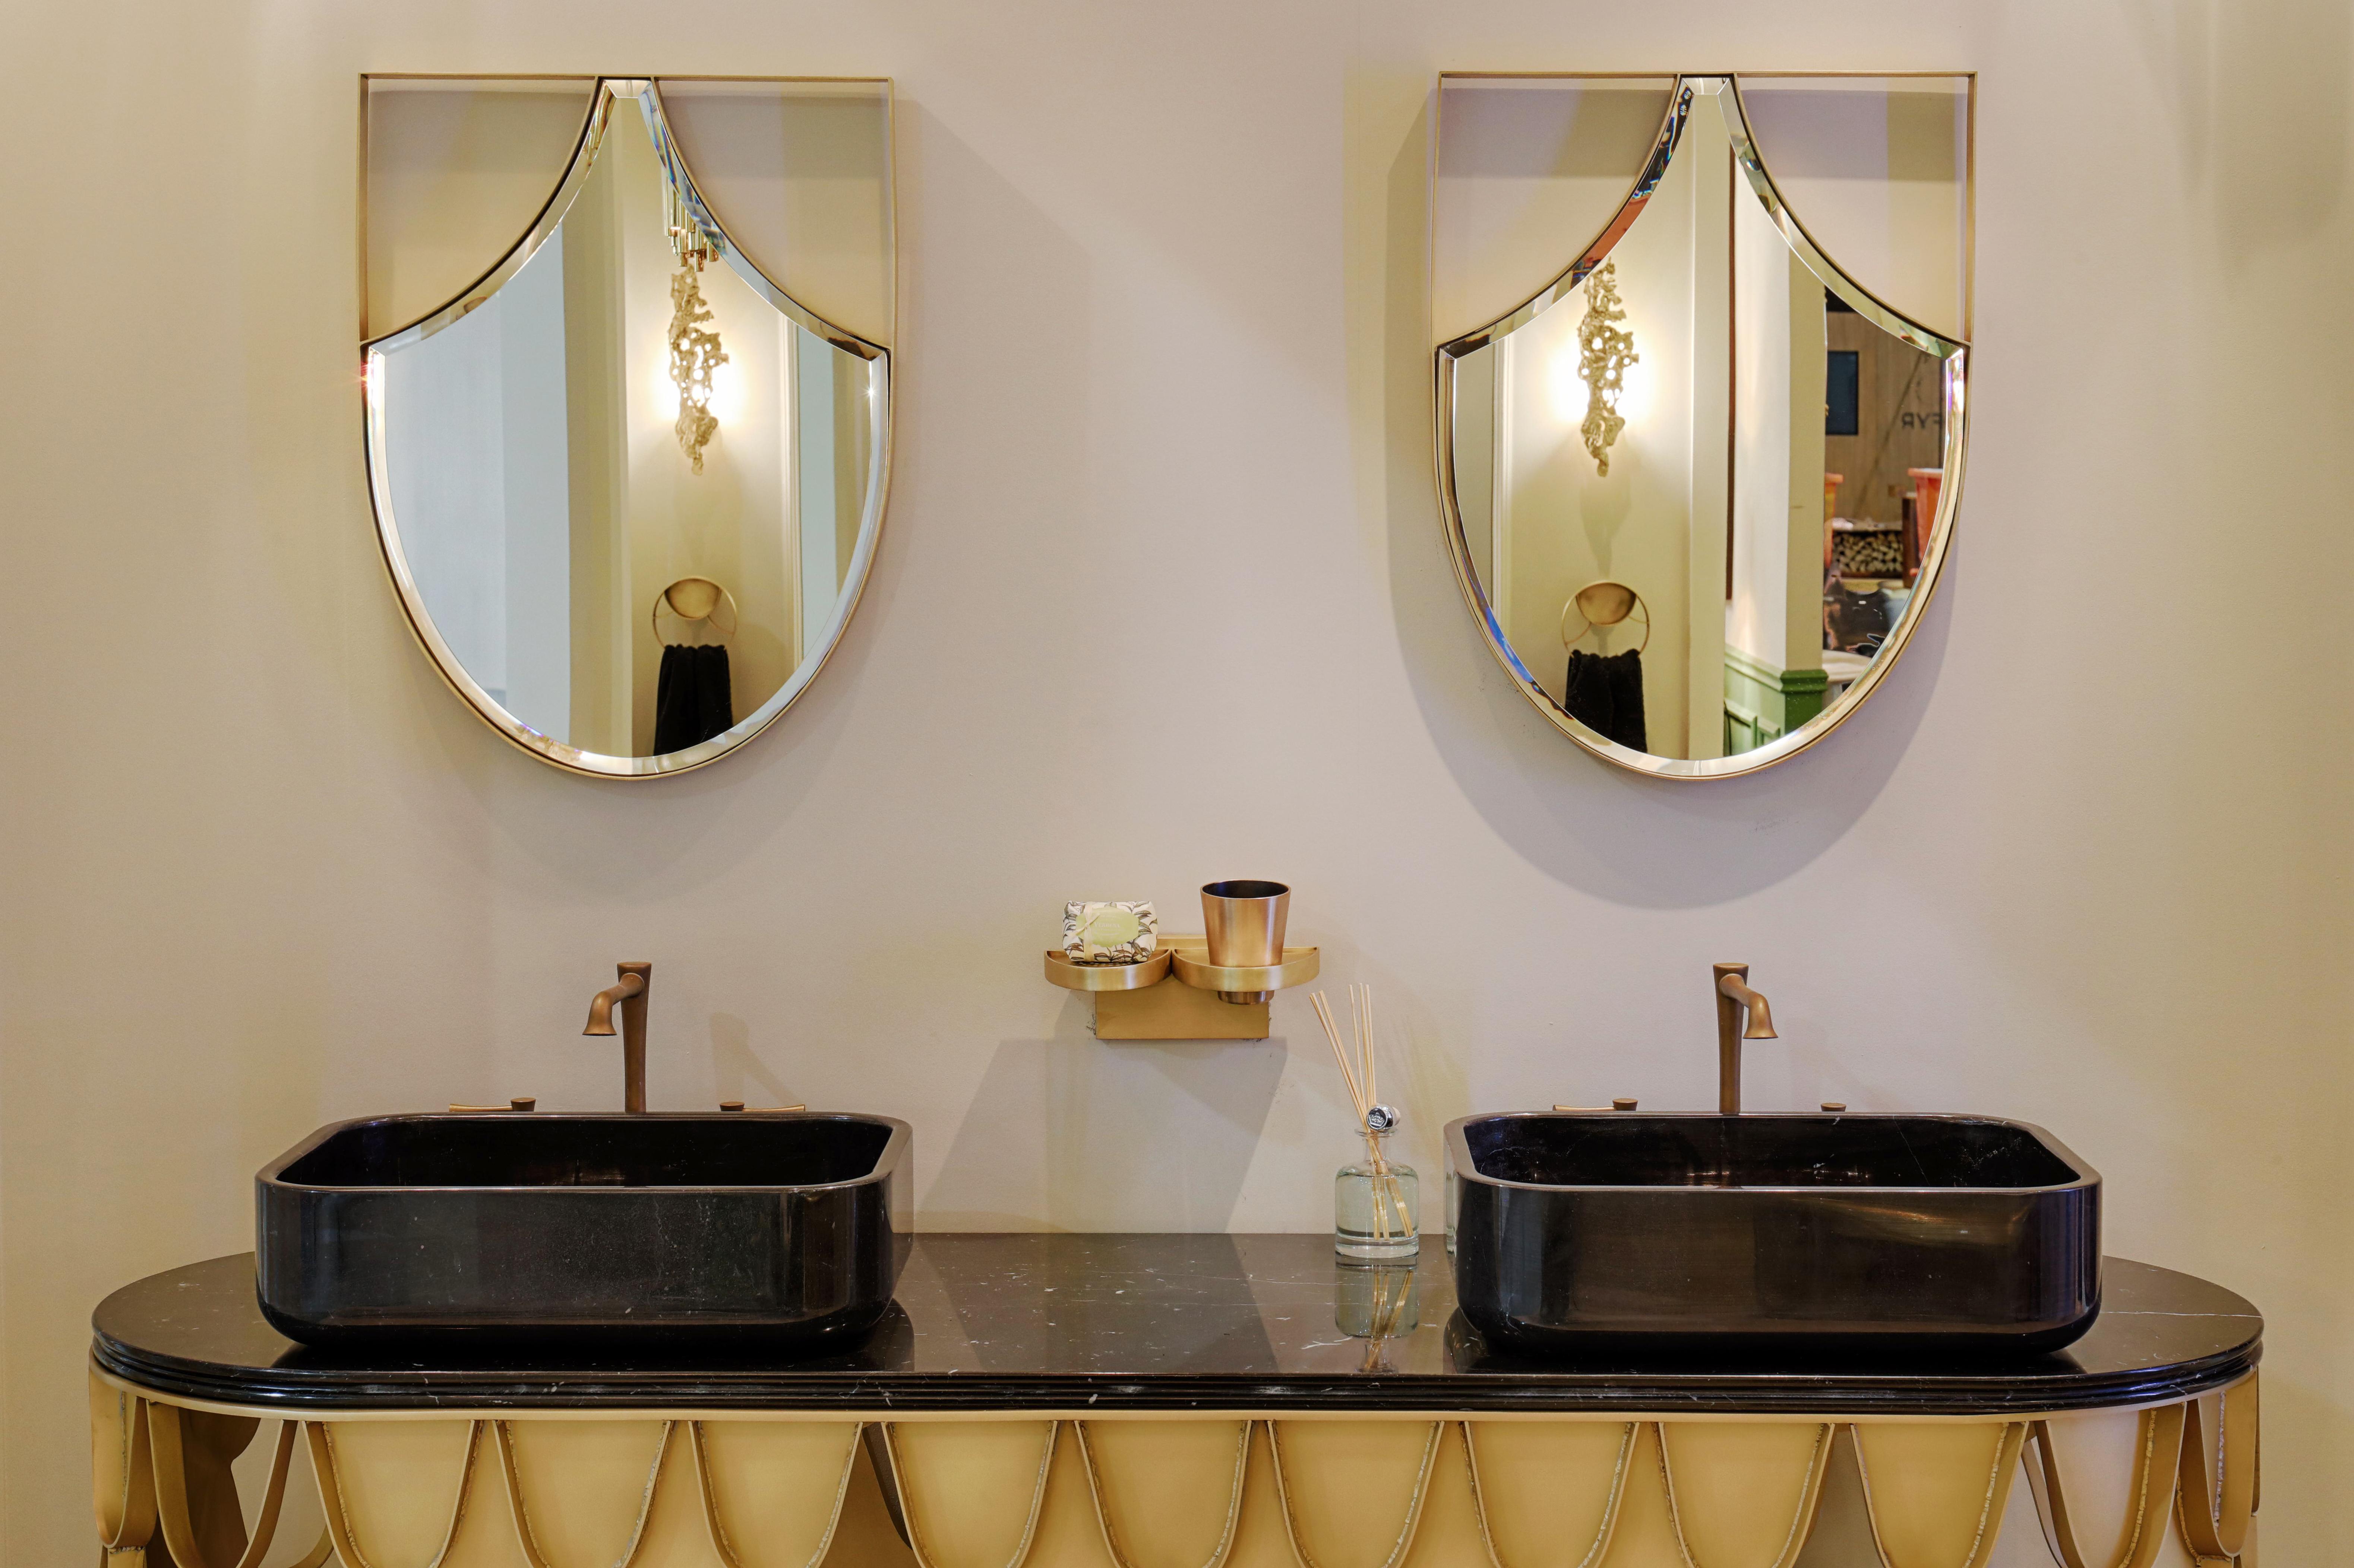 Luxury Bathrooms.Read More: http://www.maisonvalentina.net/en/inspiration-and-ideas/sem-categoria/luxury-bathroom-tips Luxury Bathroom 5 Luxury Bathroom Tips maison et objet september 7 HR